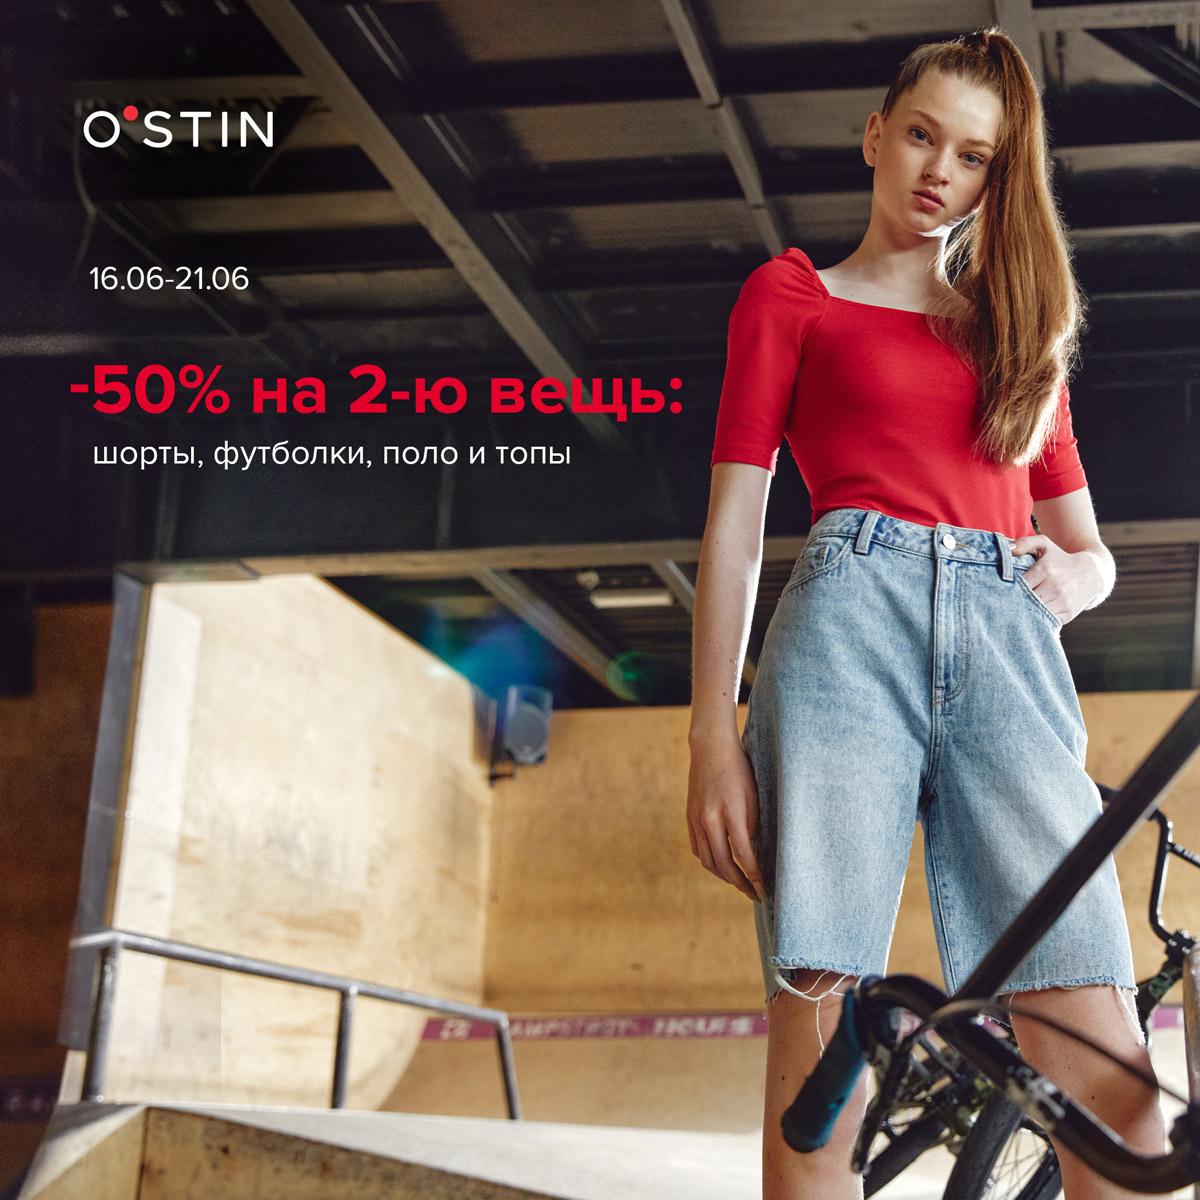 В O′STIN -  Скидка 50% на 2-ю вещь